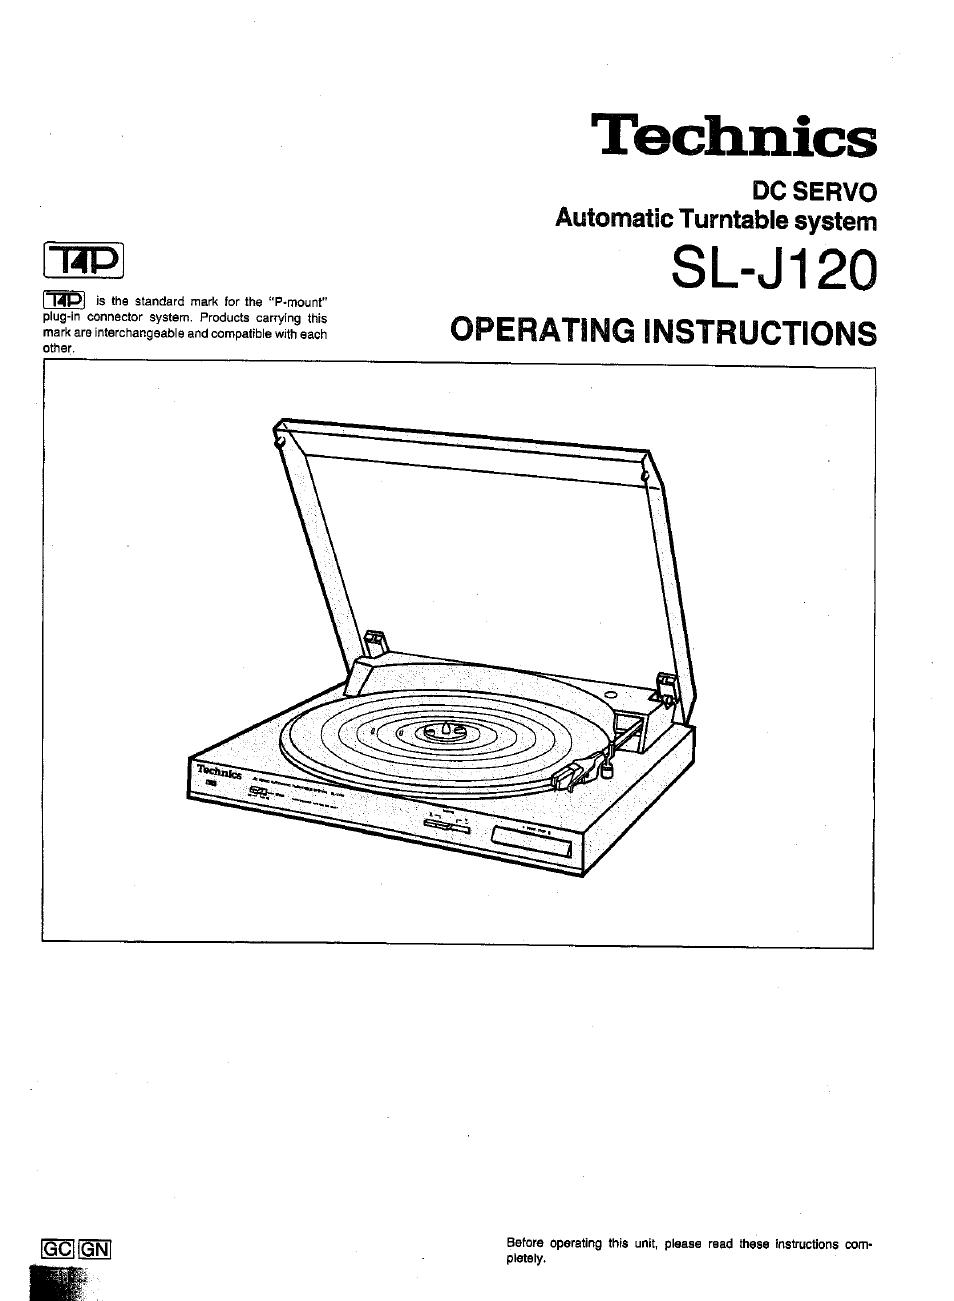 Panasonic SL-J120 User Manual | 6 pages